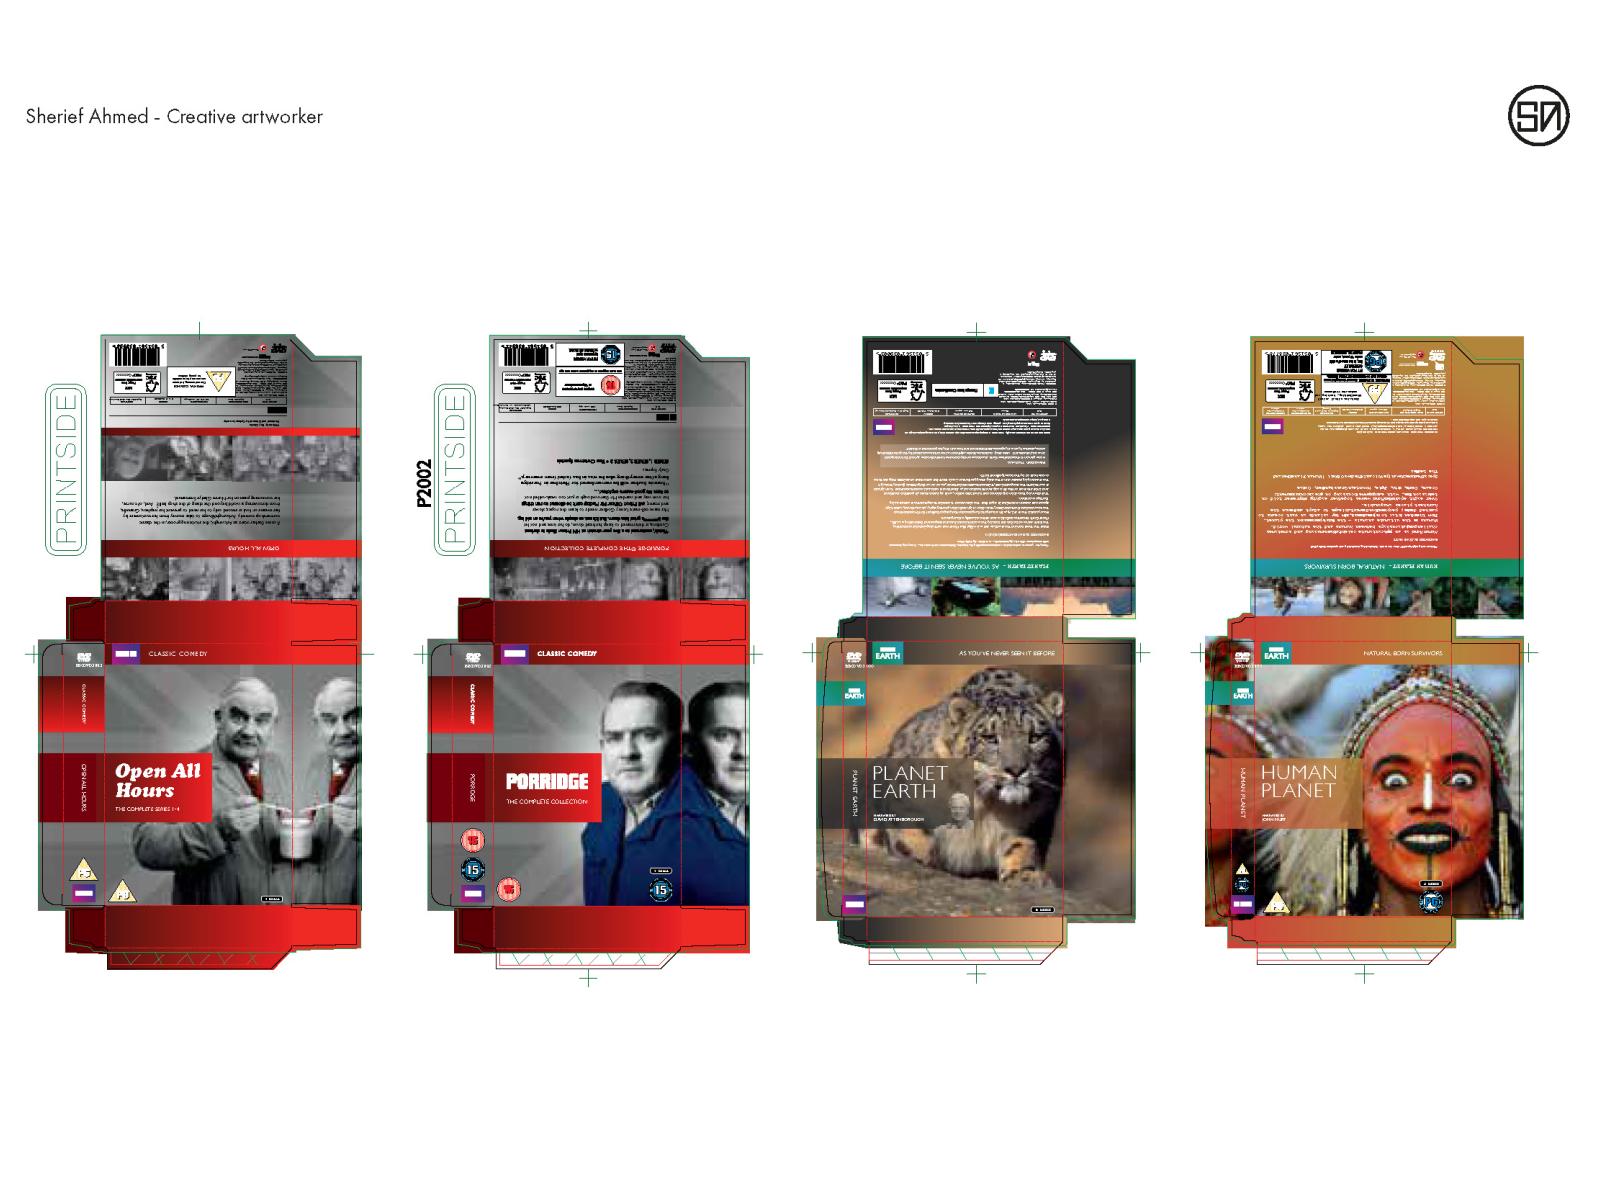 BBC DVD packaging artworking